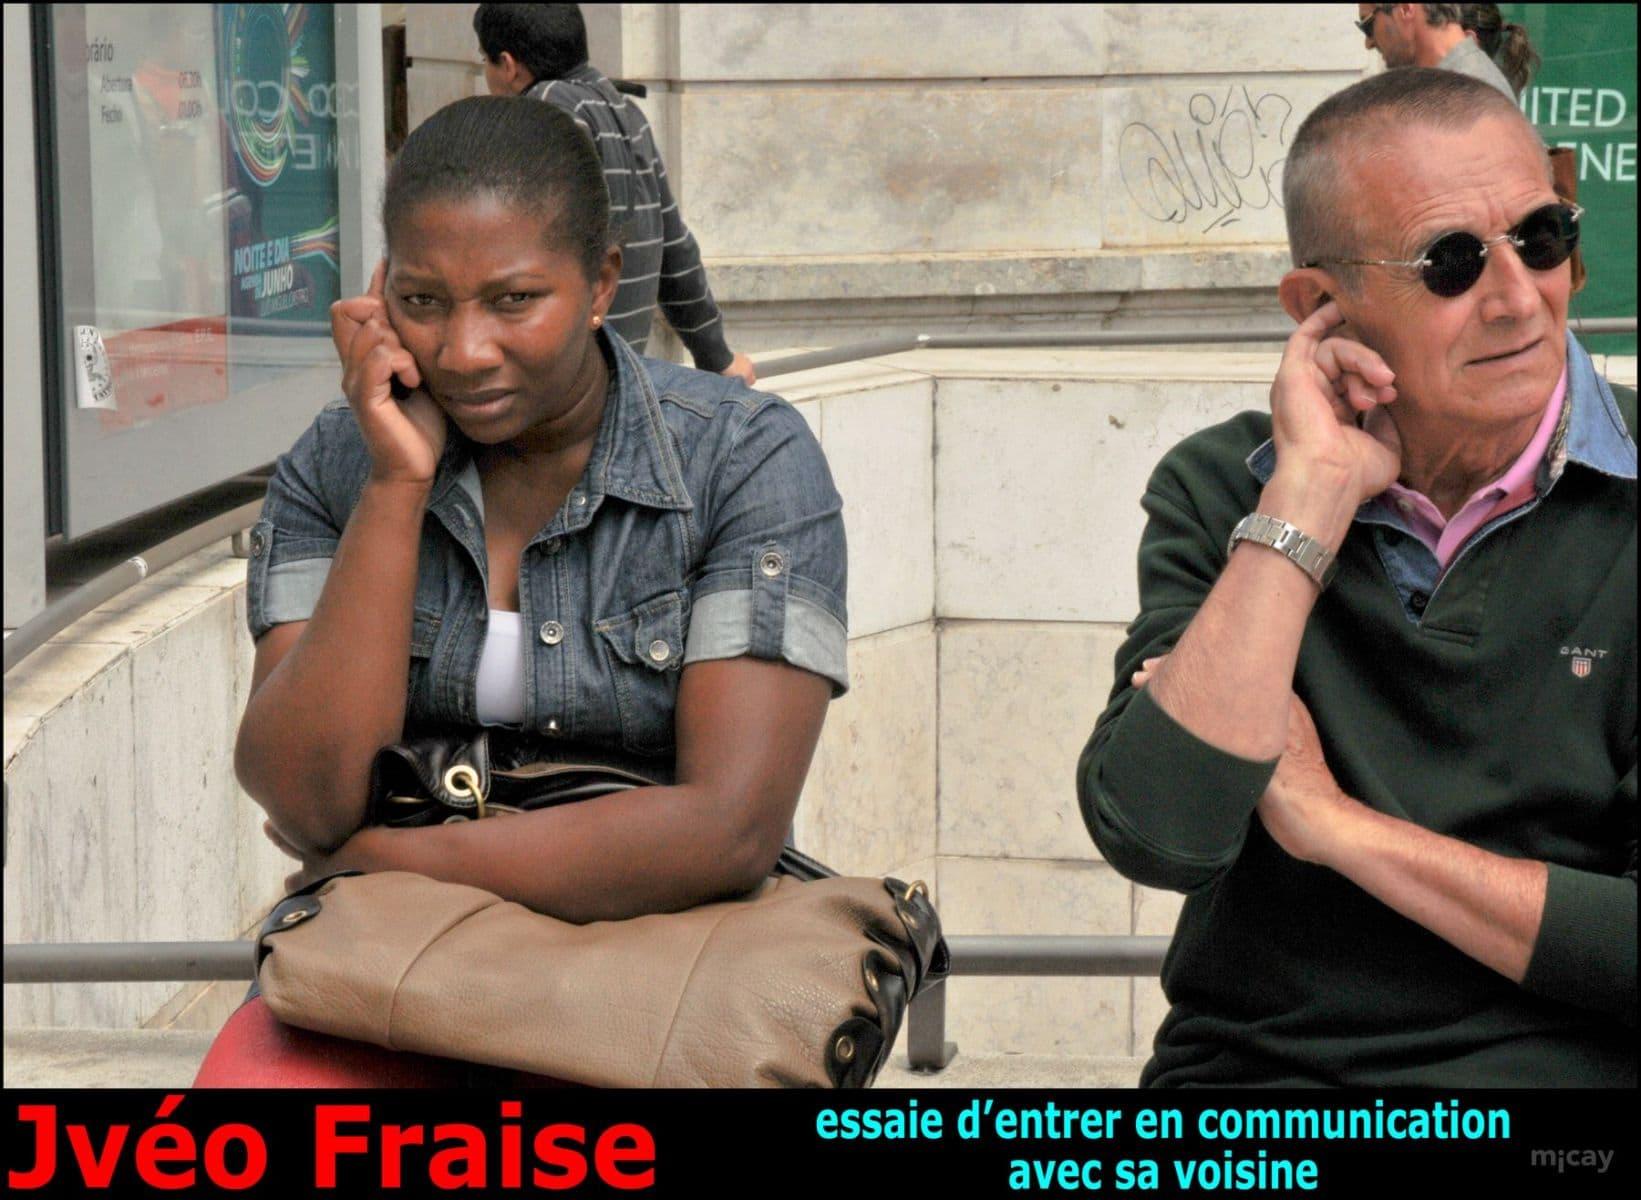 MichelAycaguer-JveoFraise-streetphotography-2